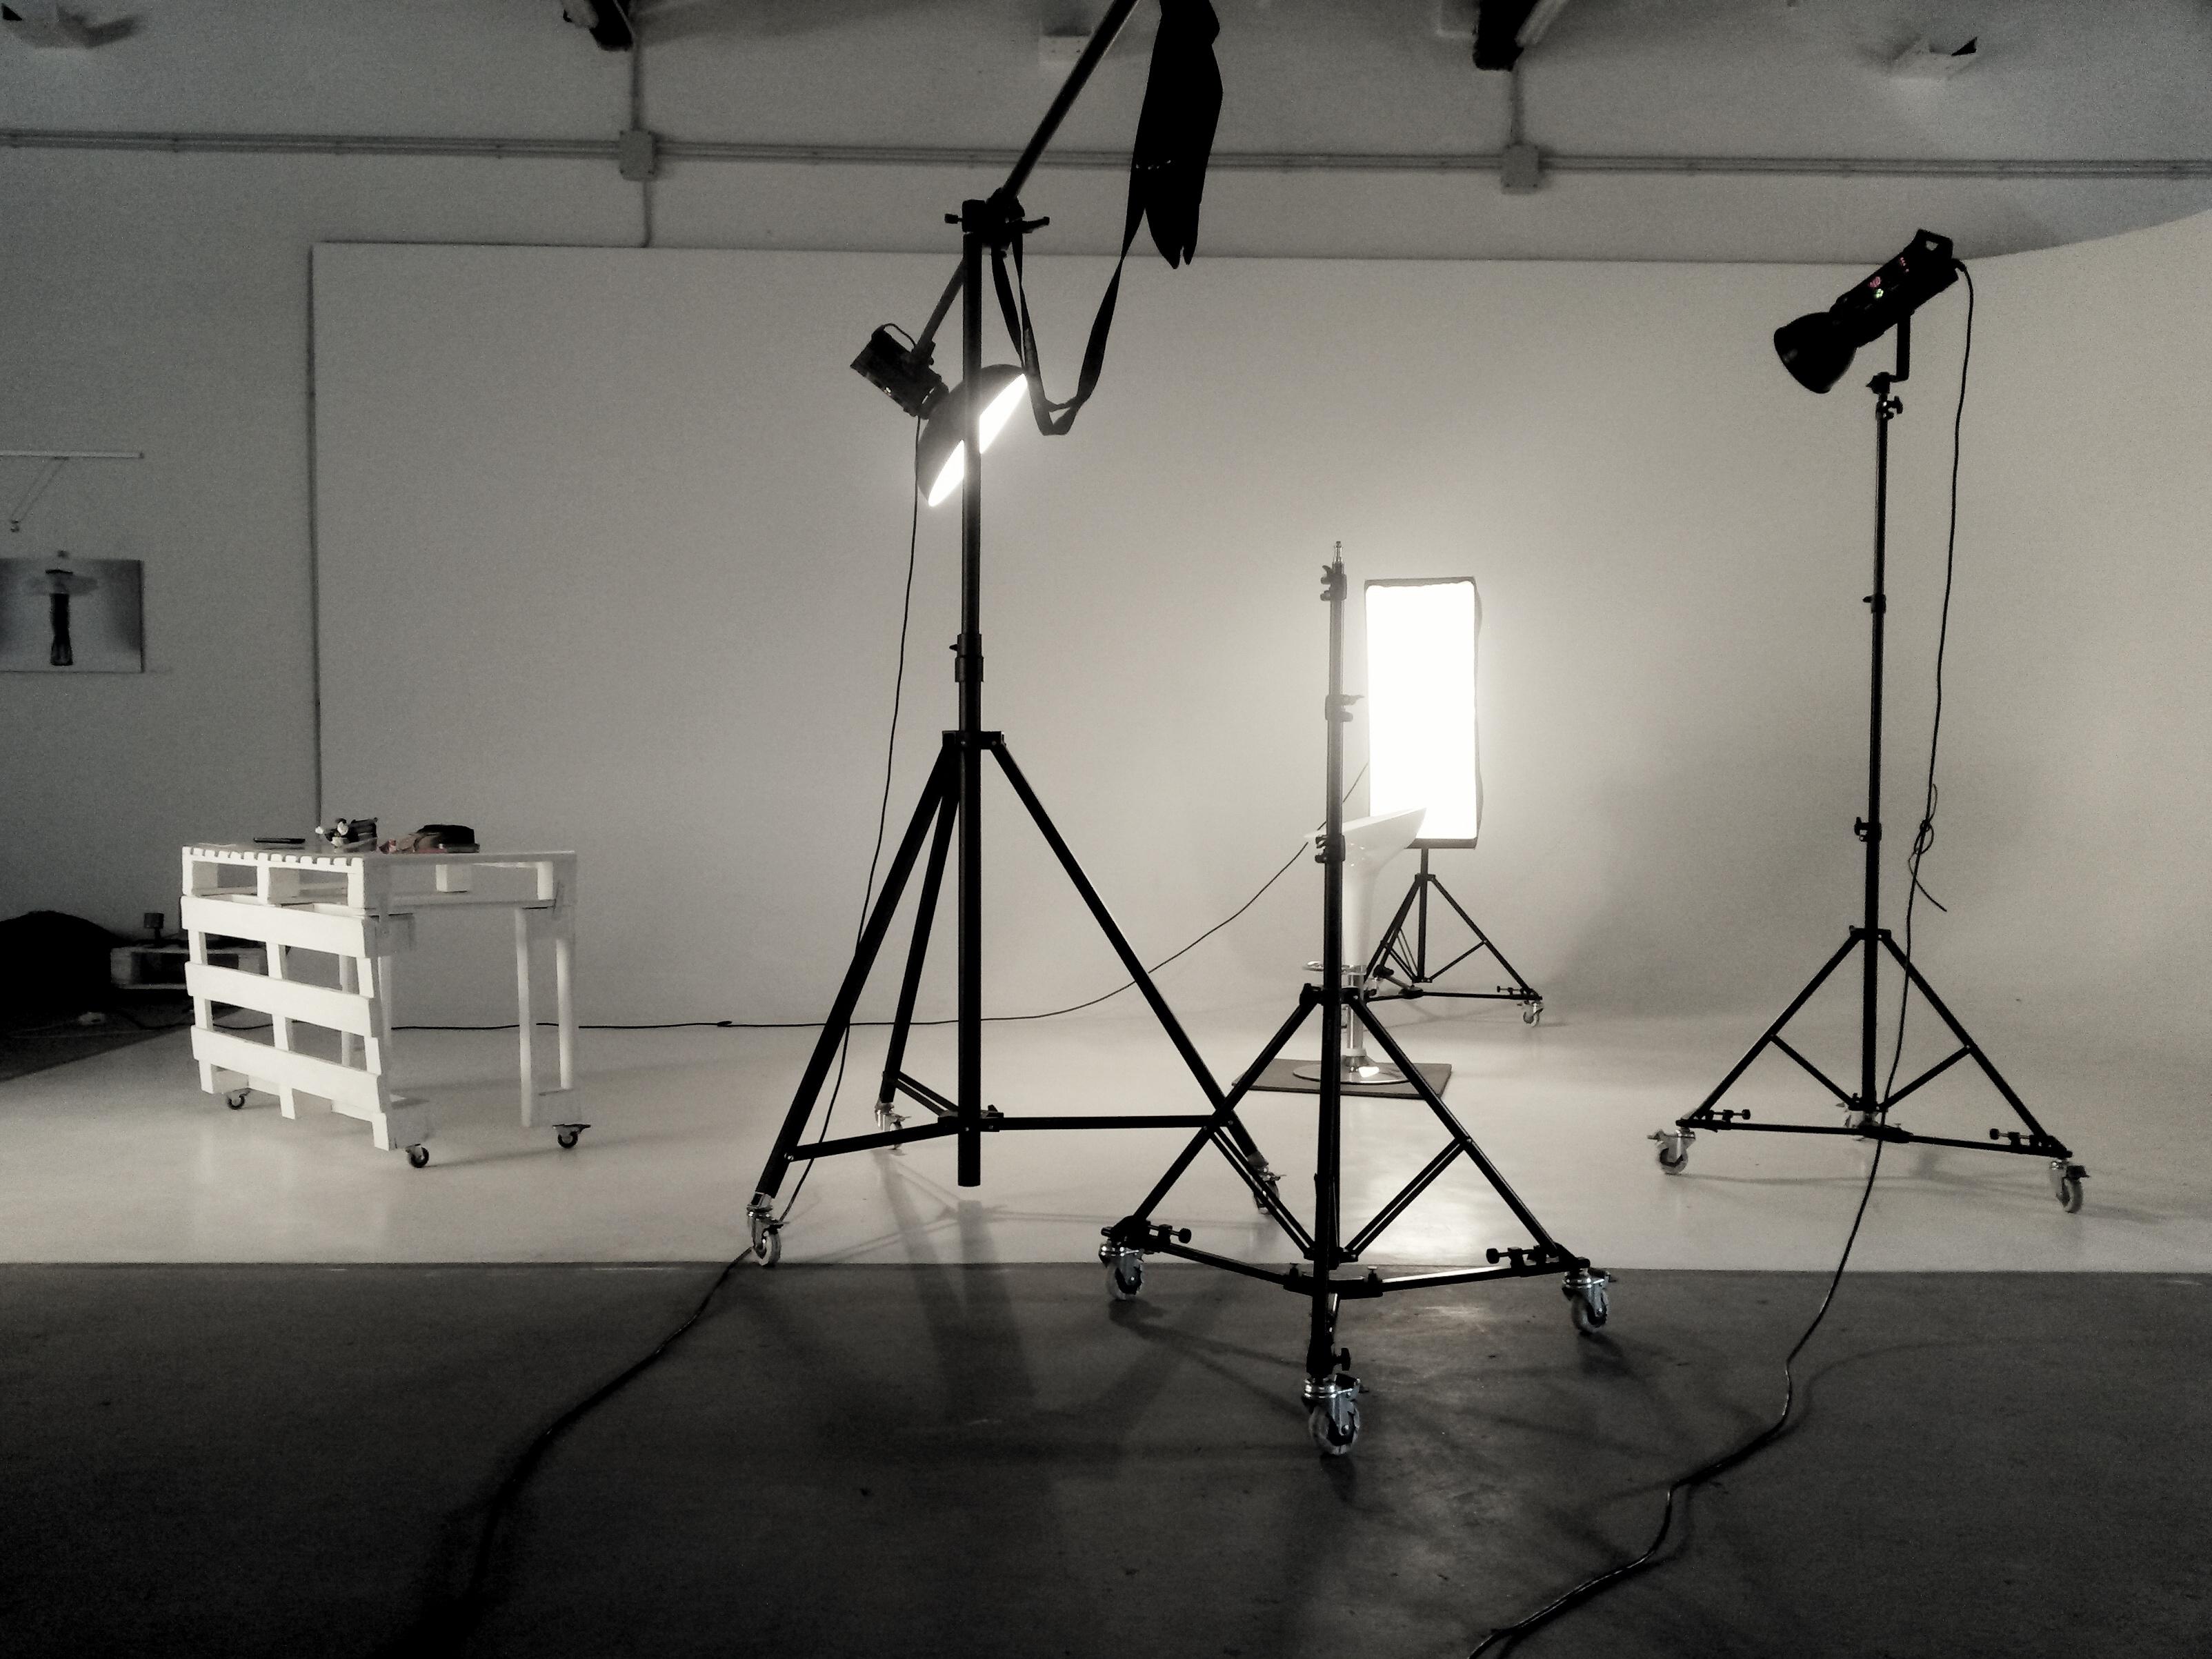 noleggio limbo cyclorama roma sala posa studio fotografico13